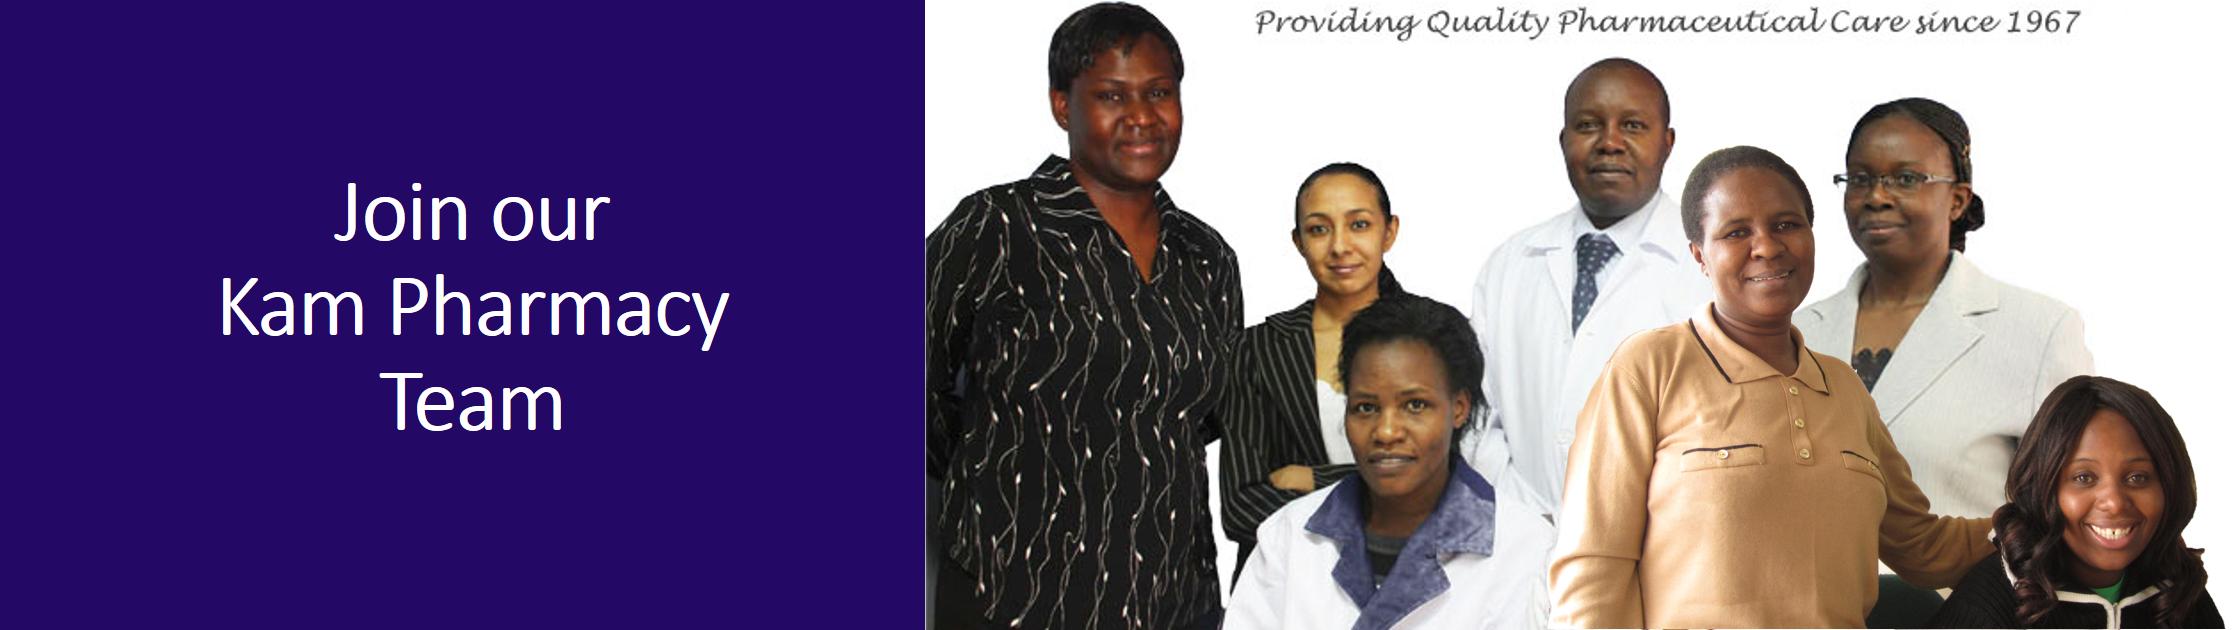 Join our Kam Pharmacy Team